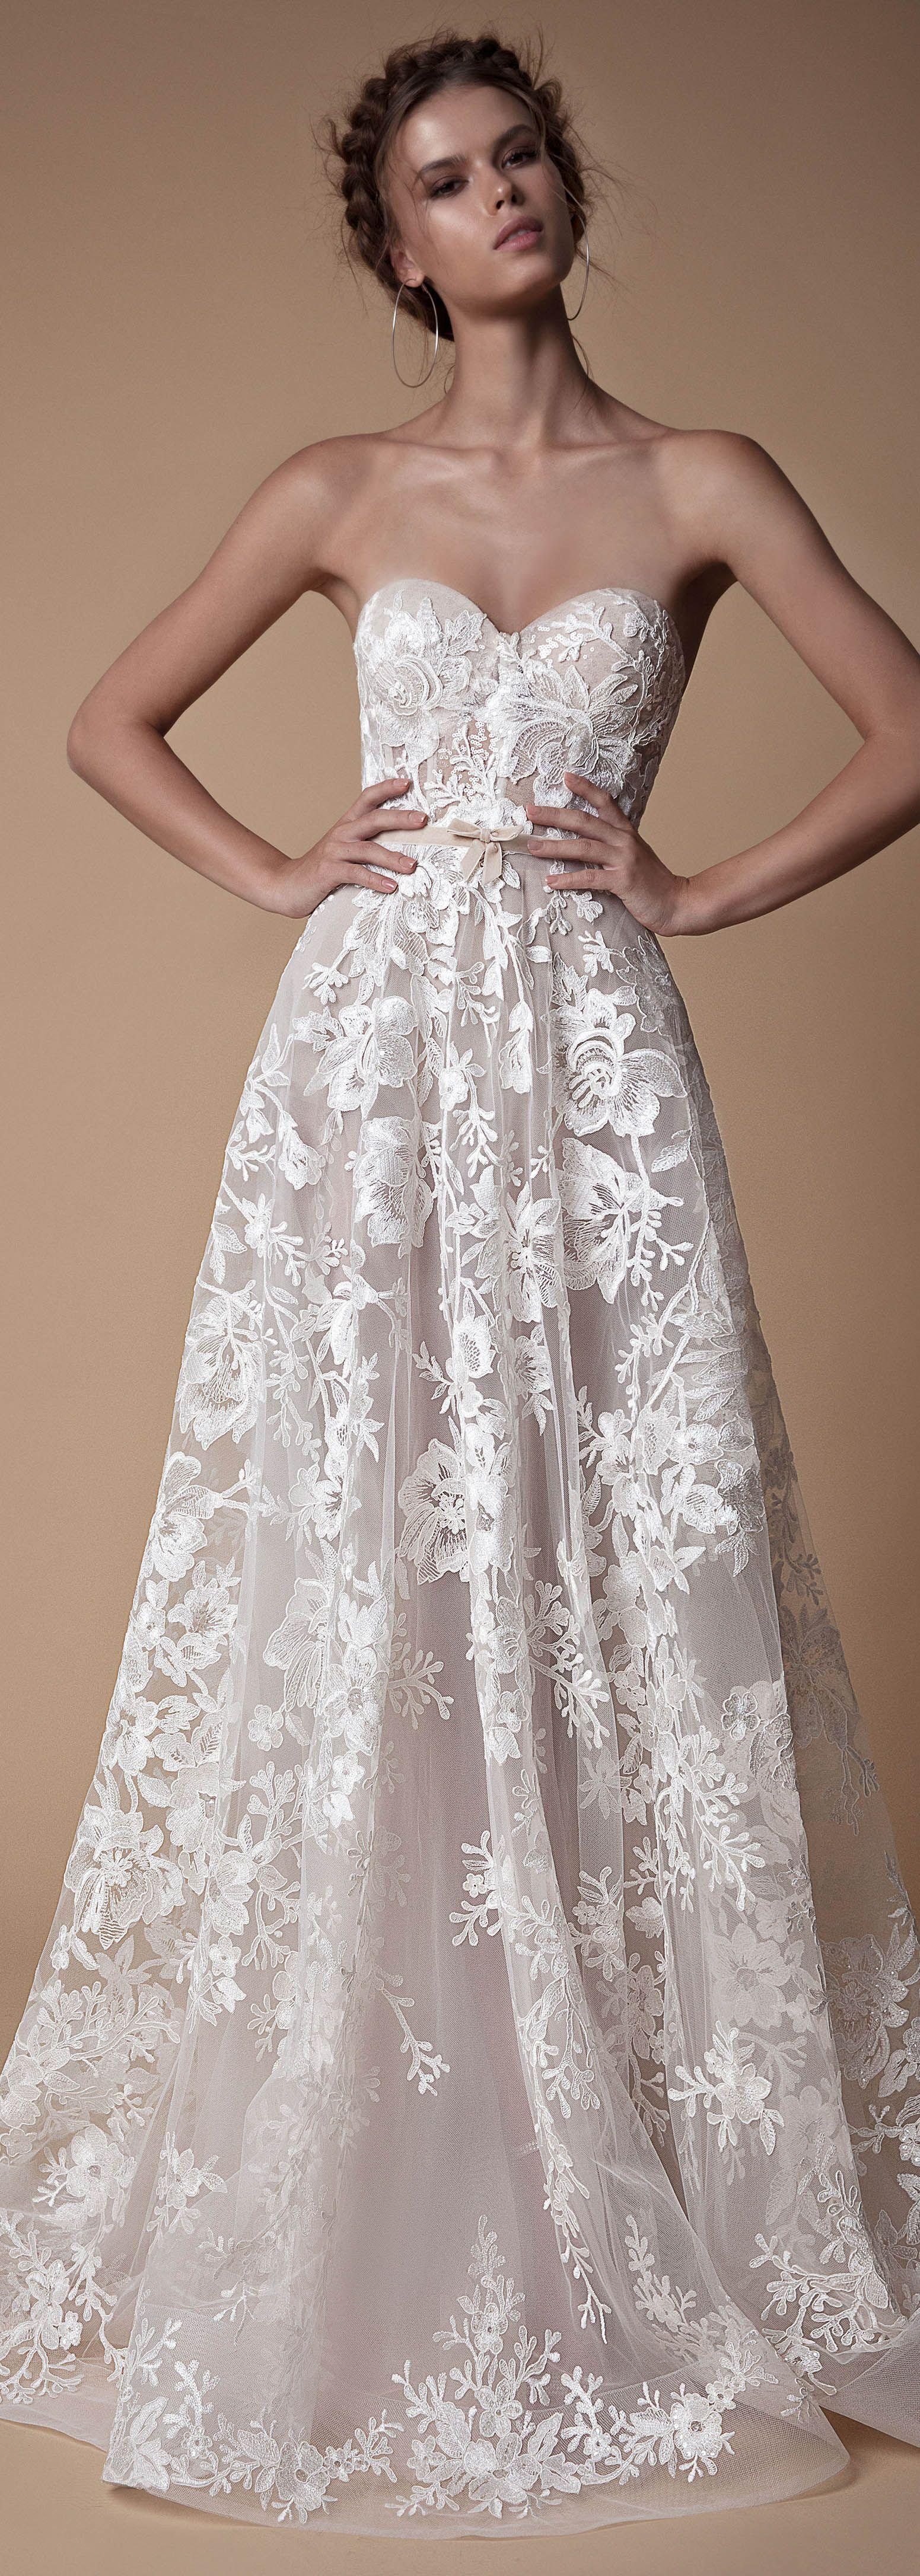 Berta muse collection bertabridal weddingdresse bridalgown